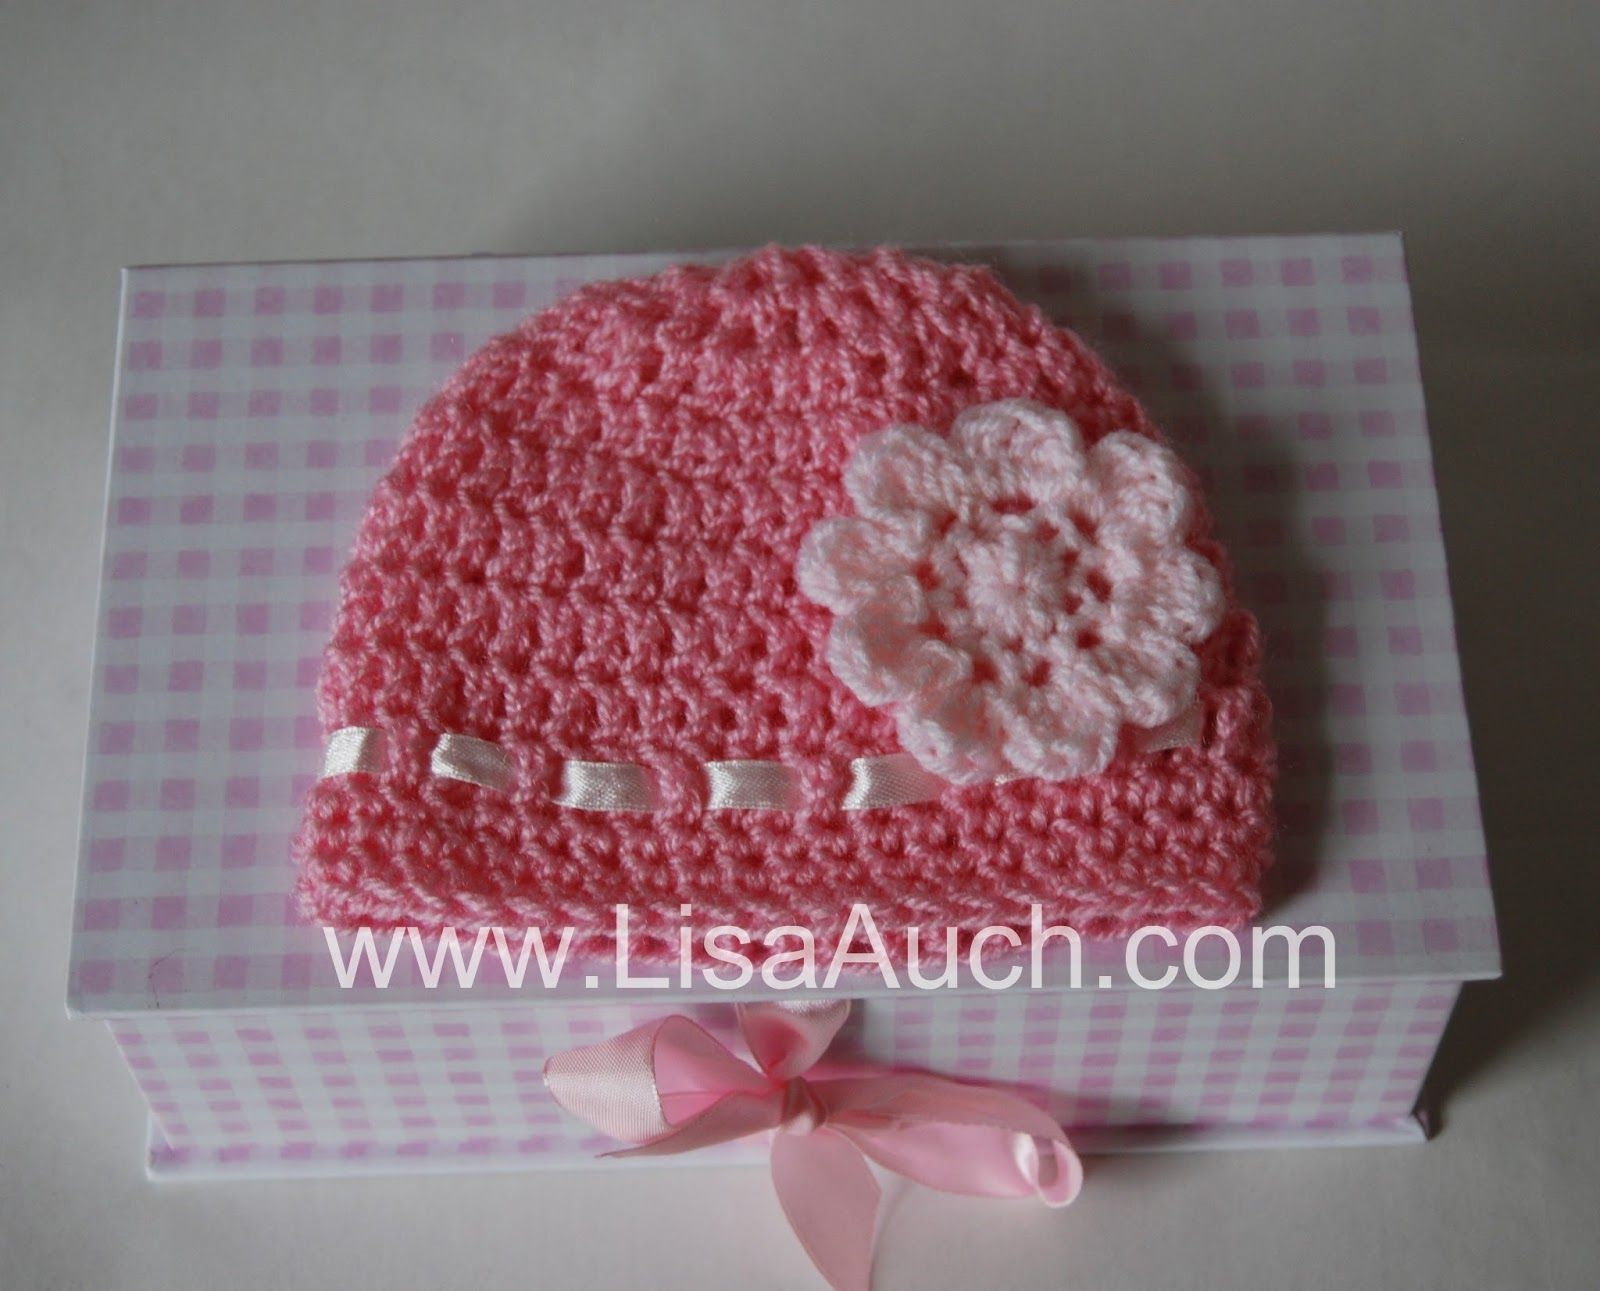 baby+beanie-free-crochet-hat-pattern-baby-girl.JPG (1600×1291) | ㅎ ...